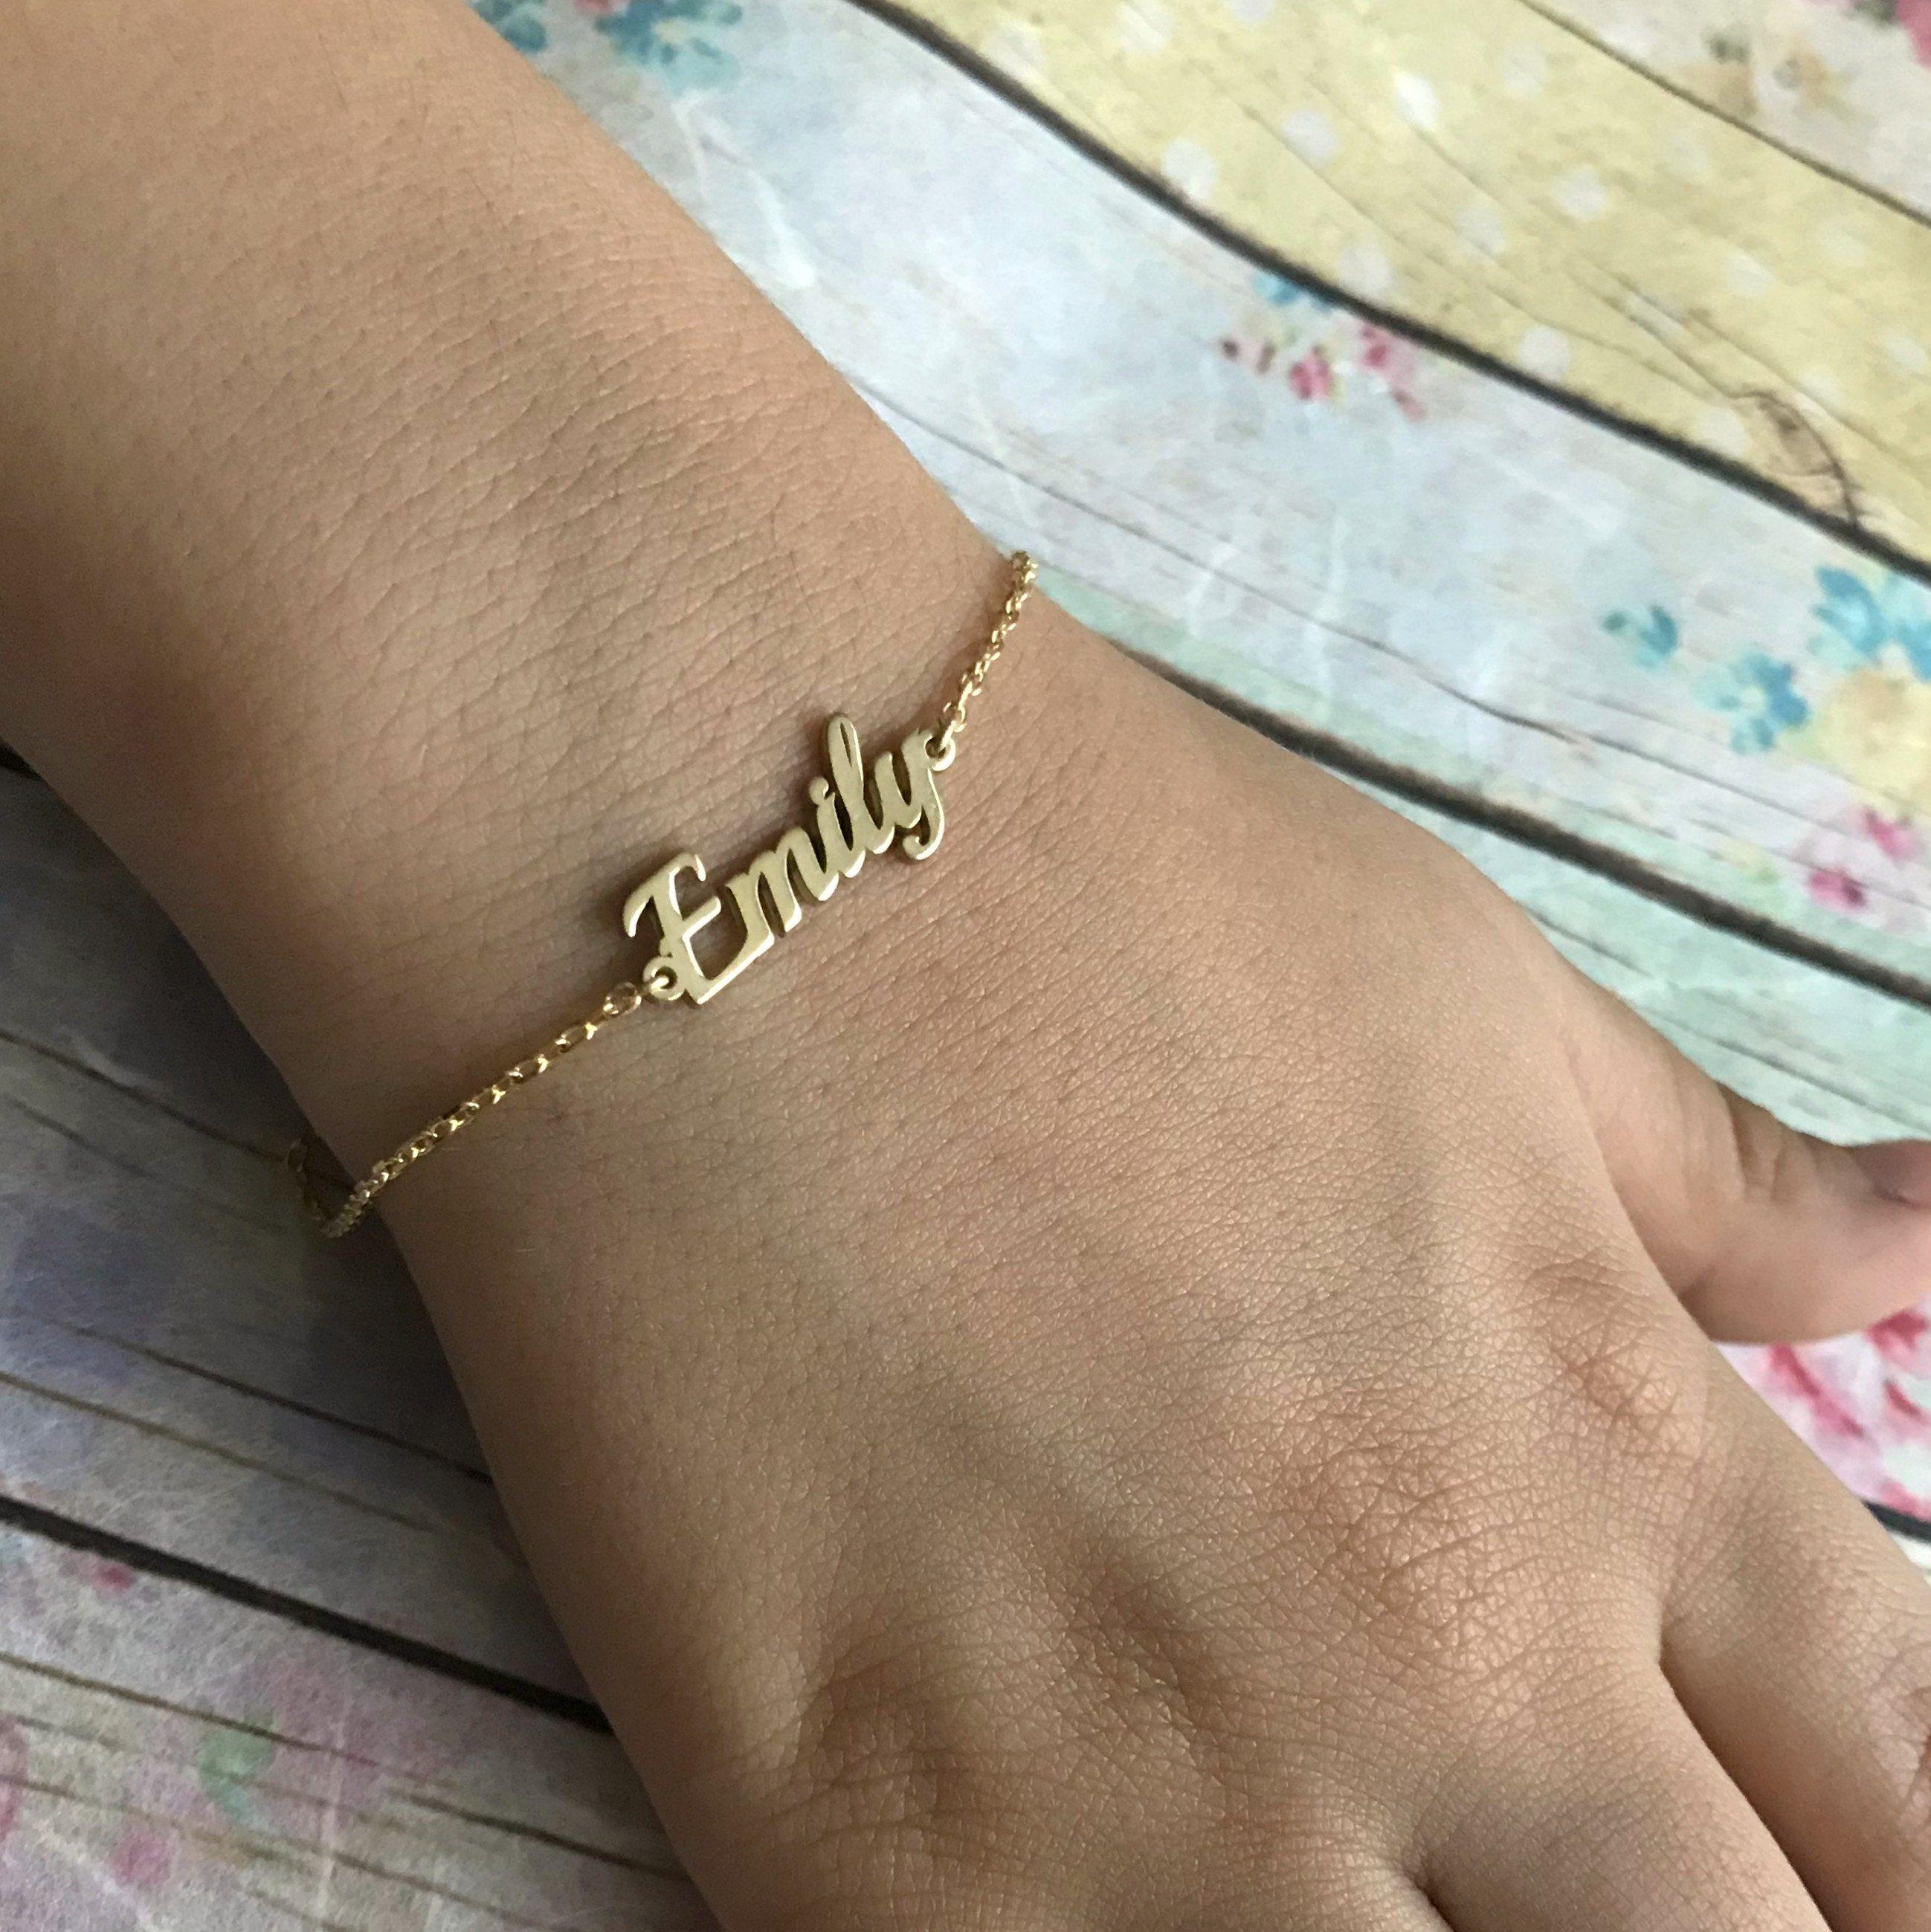 14k Solid Gold Child Bracelet Personalized Name Bracelet Kids Name Bracelet Custom Name Newborn Bracelet Gif Name Bracelet Name Jewelry Paw Jewelry